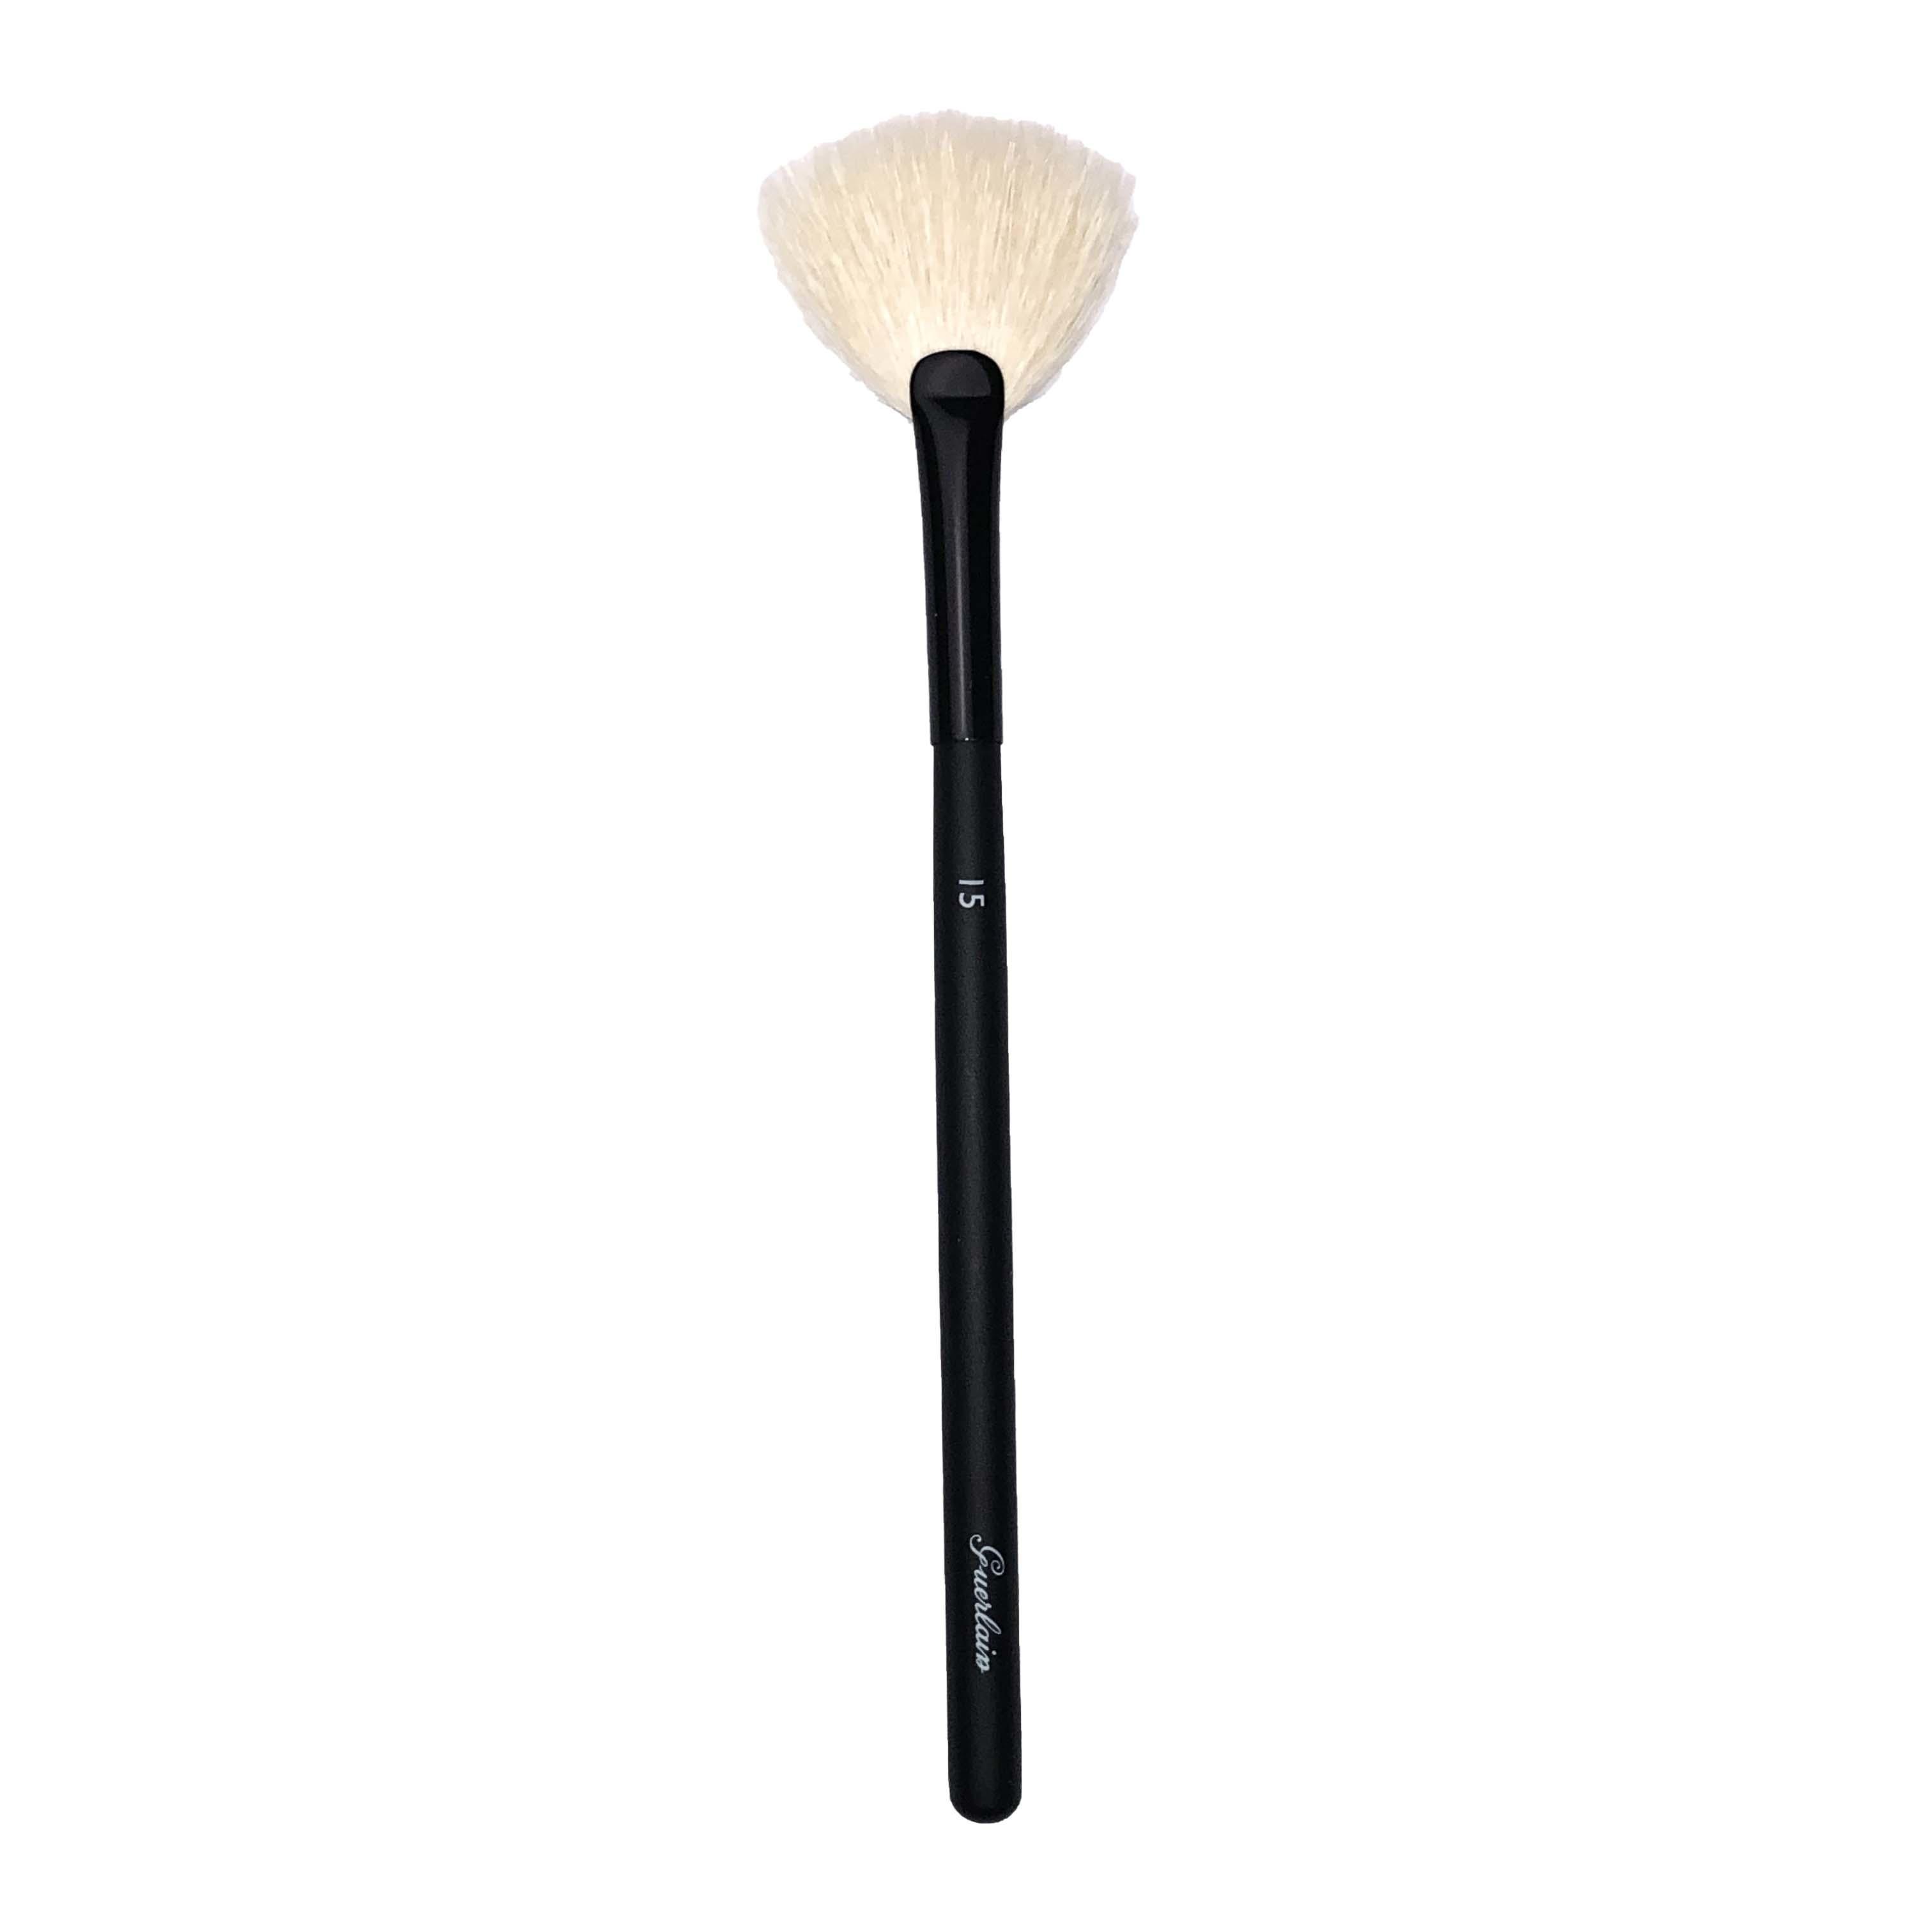 Guerlain Diffusing Fan Face Brush 15